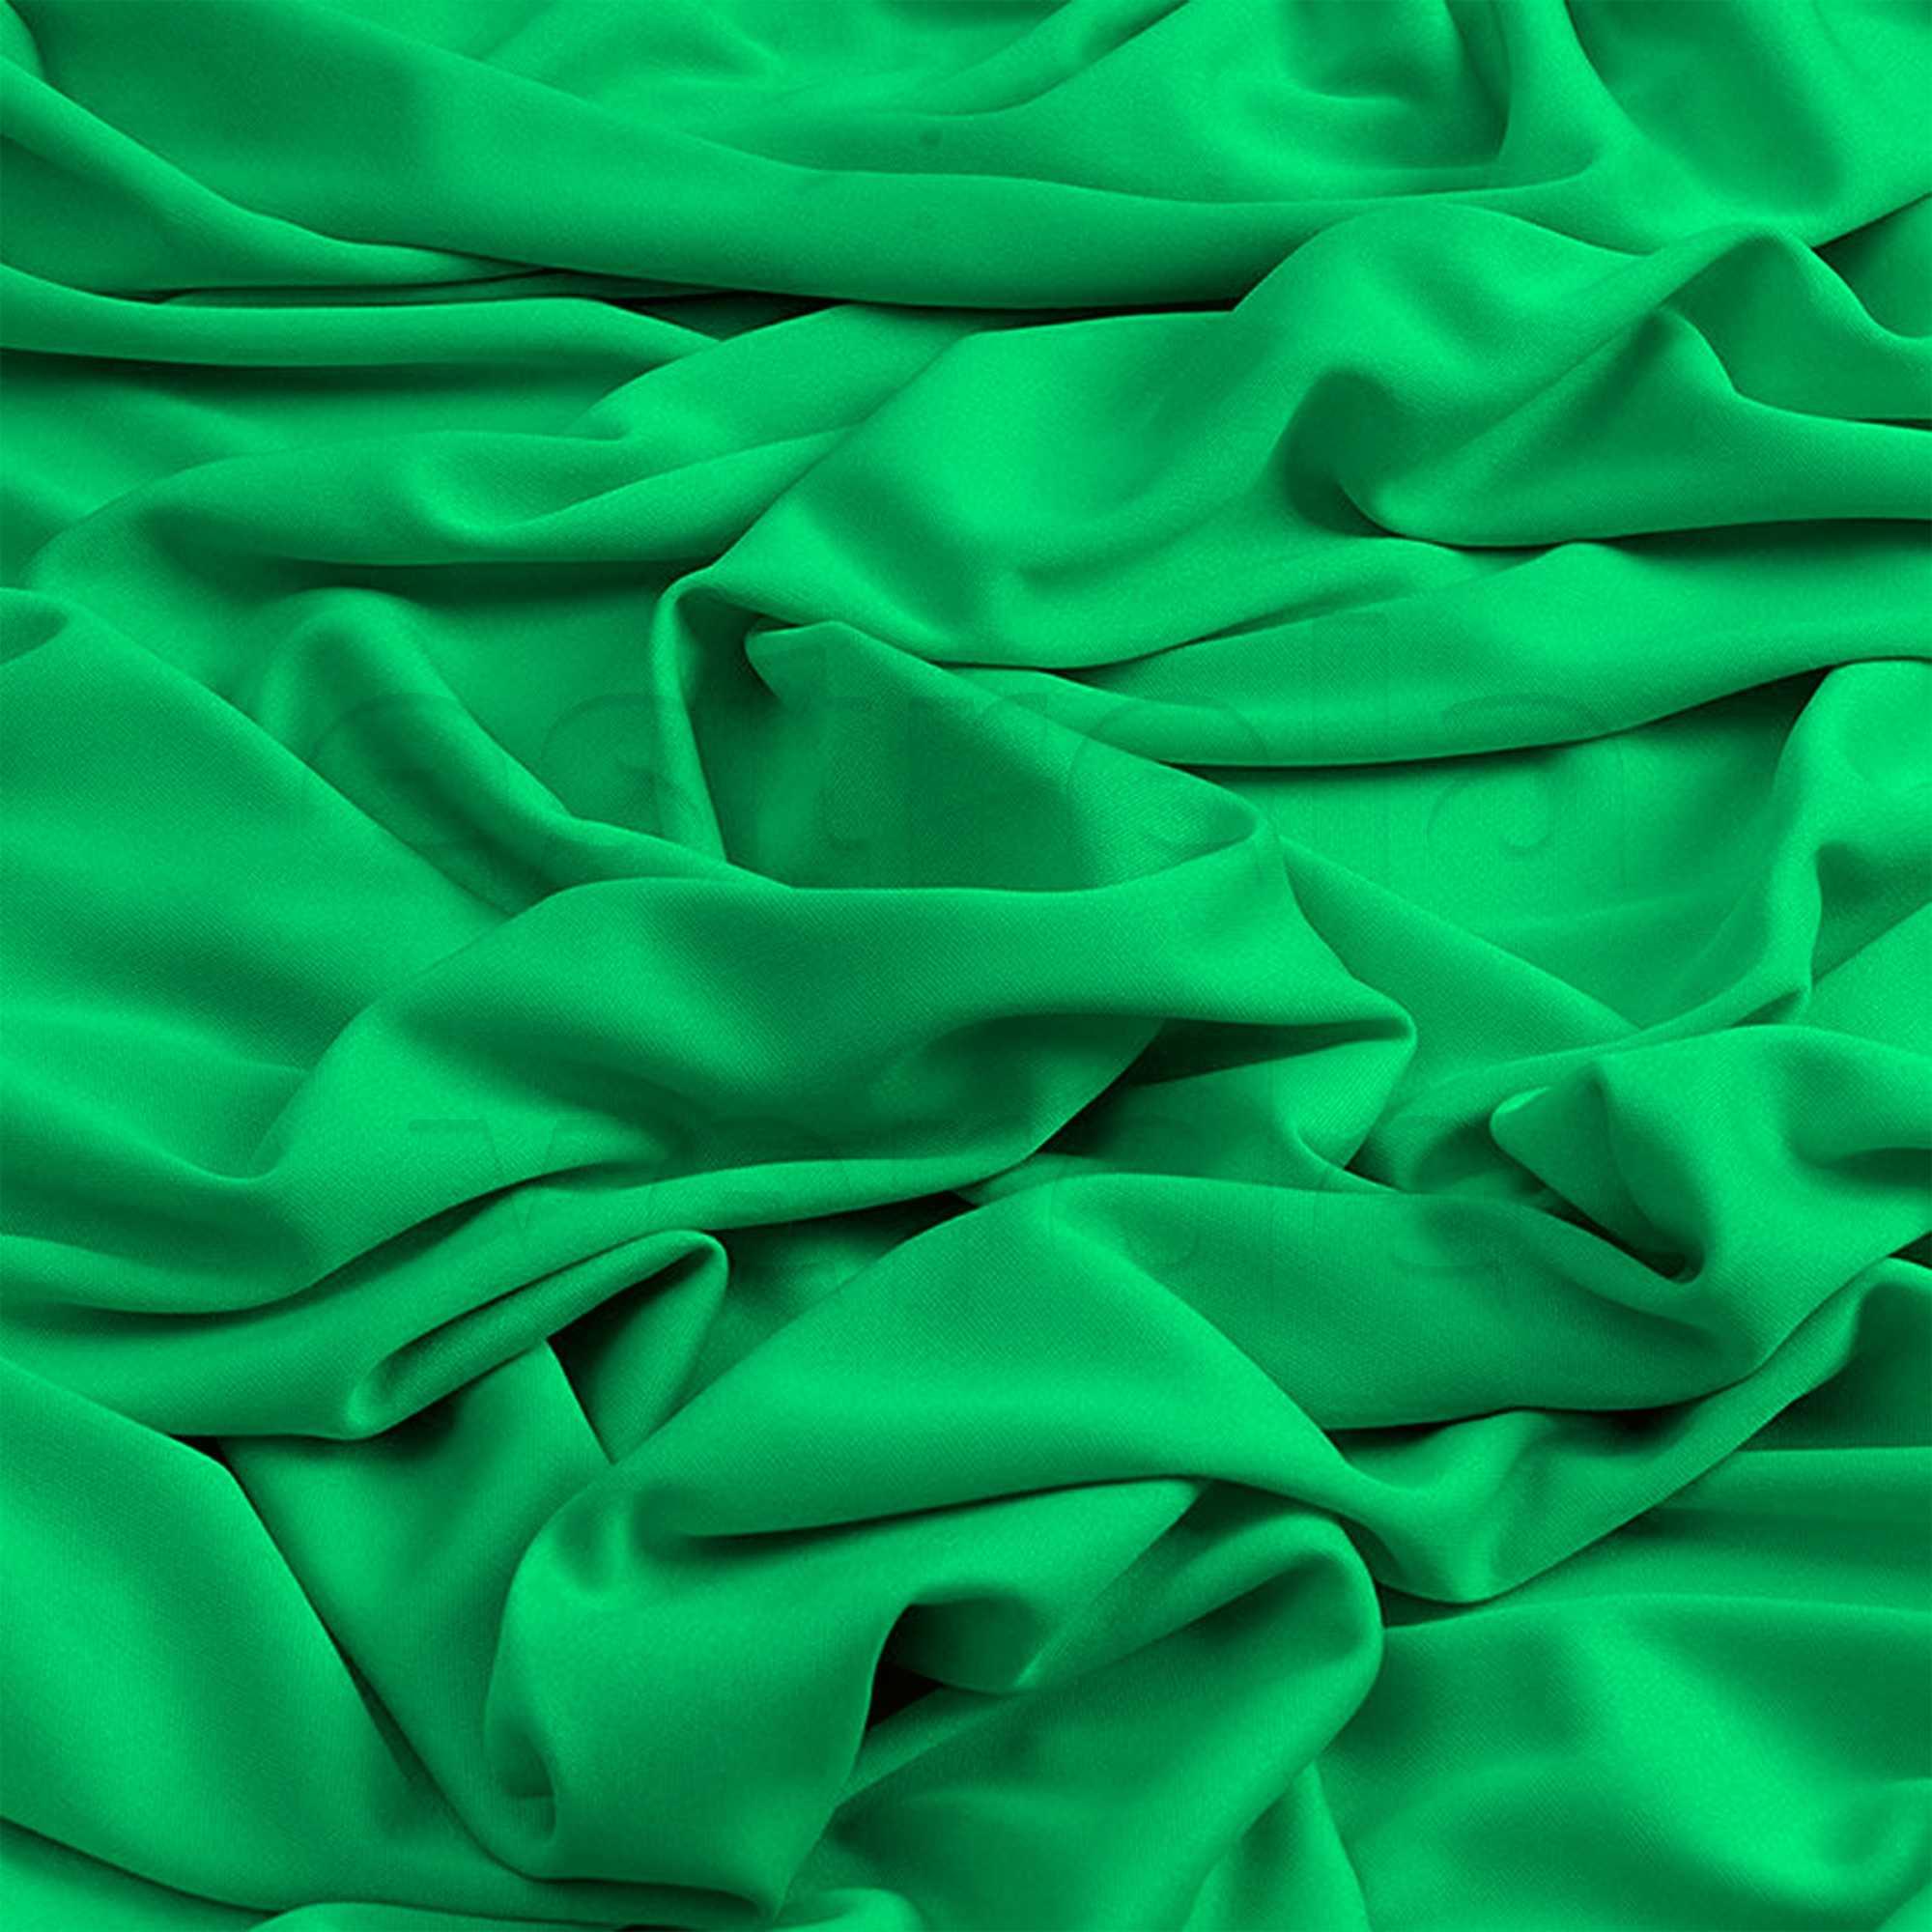 HELANCA LIGHT VERDE BANDEIRA 640 1,80 LARG  - Estrela Verde